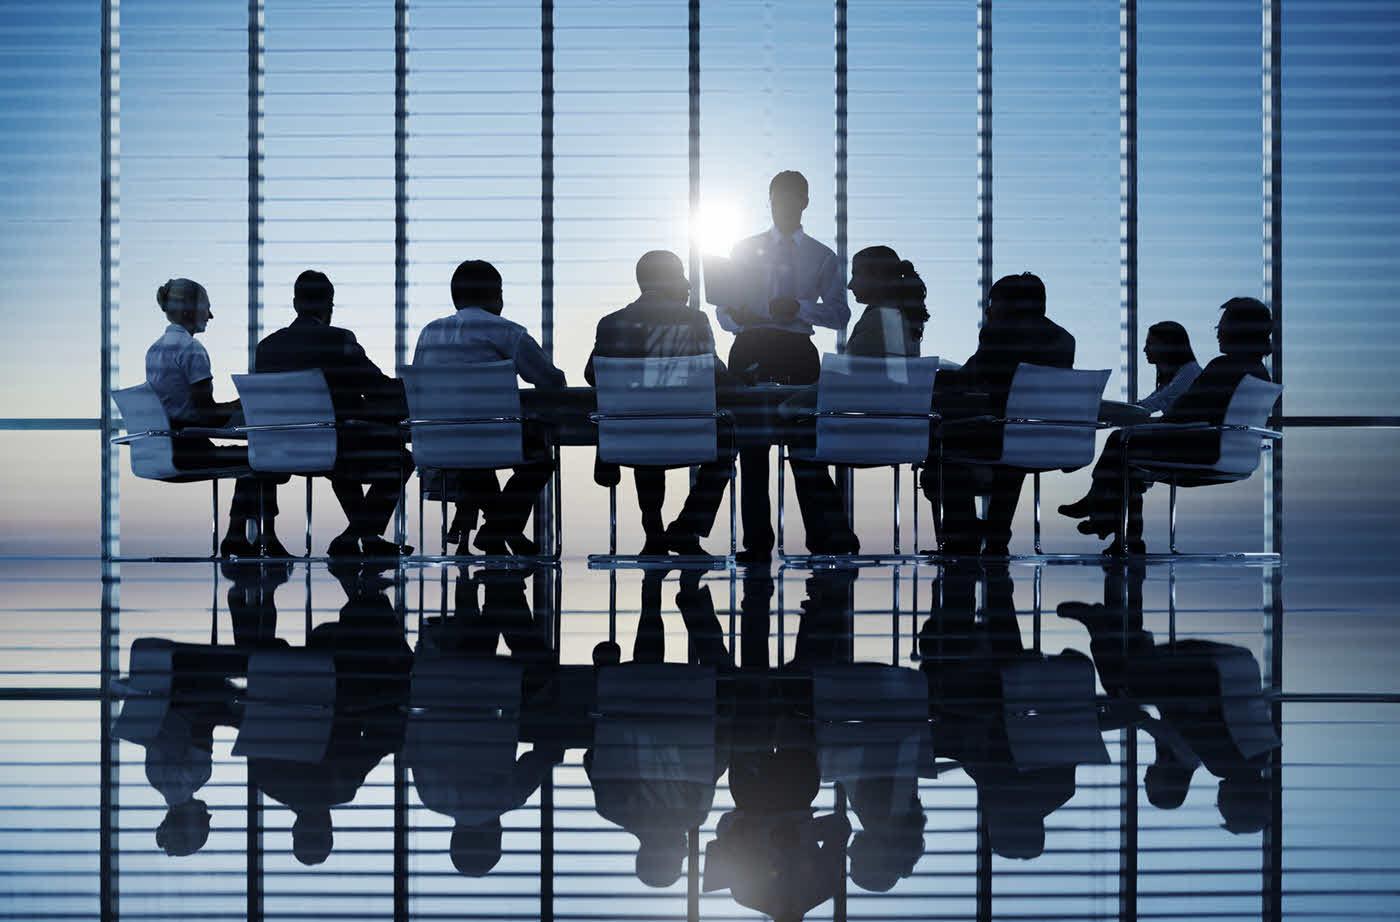 cpa-accountant-leadership